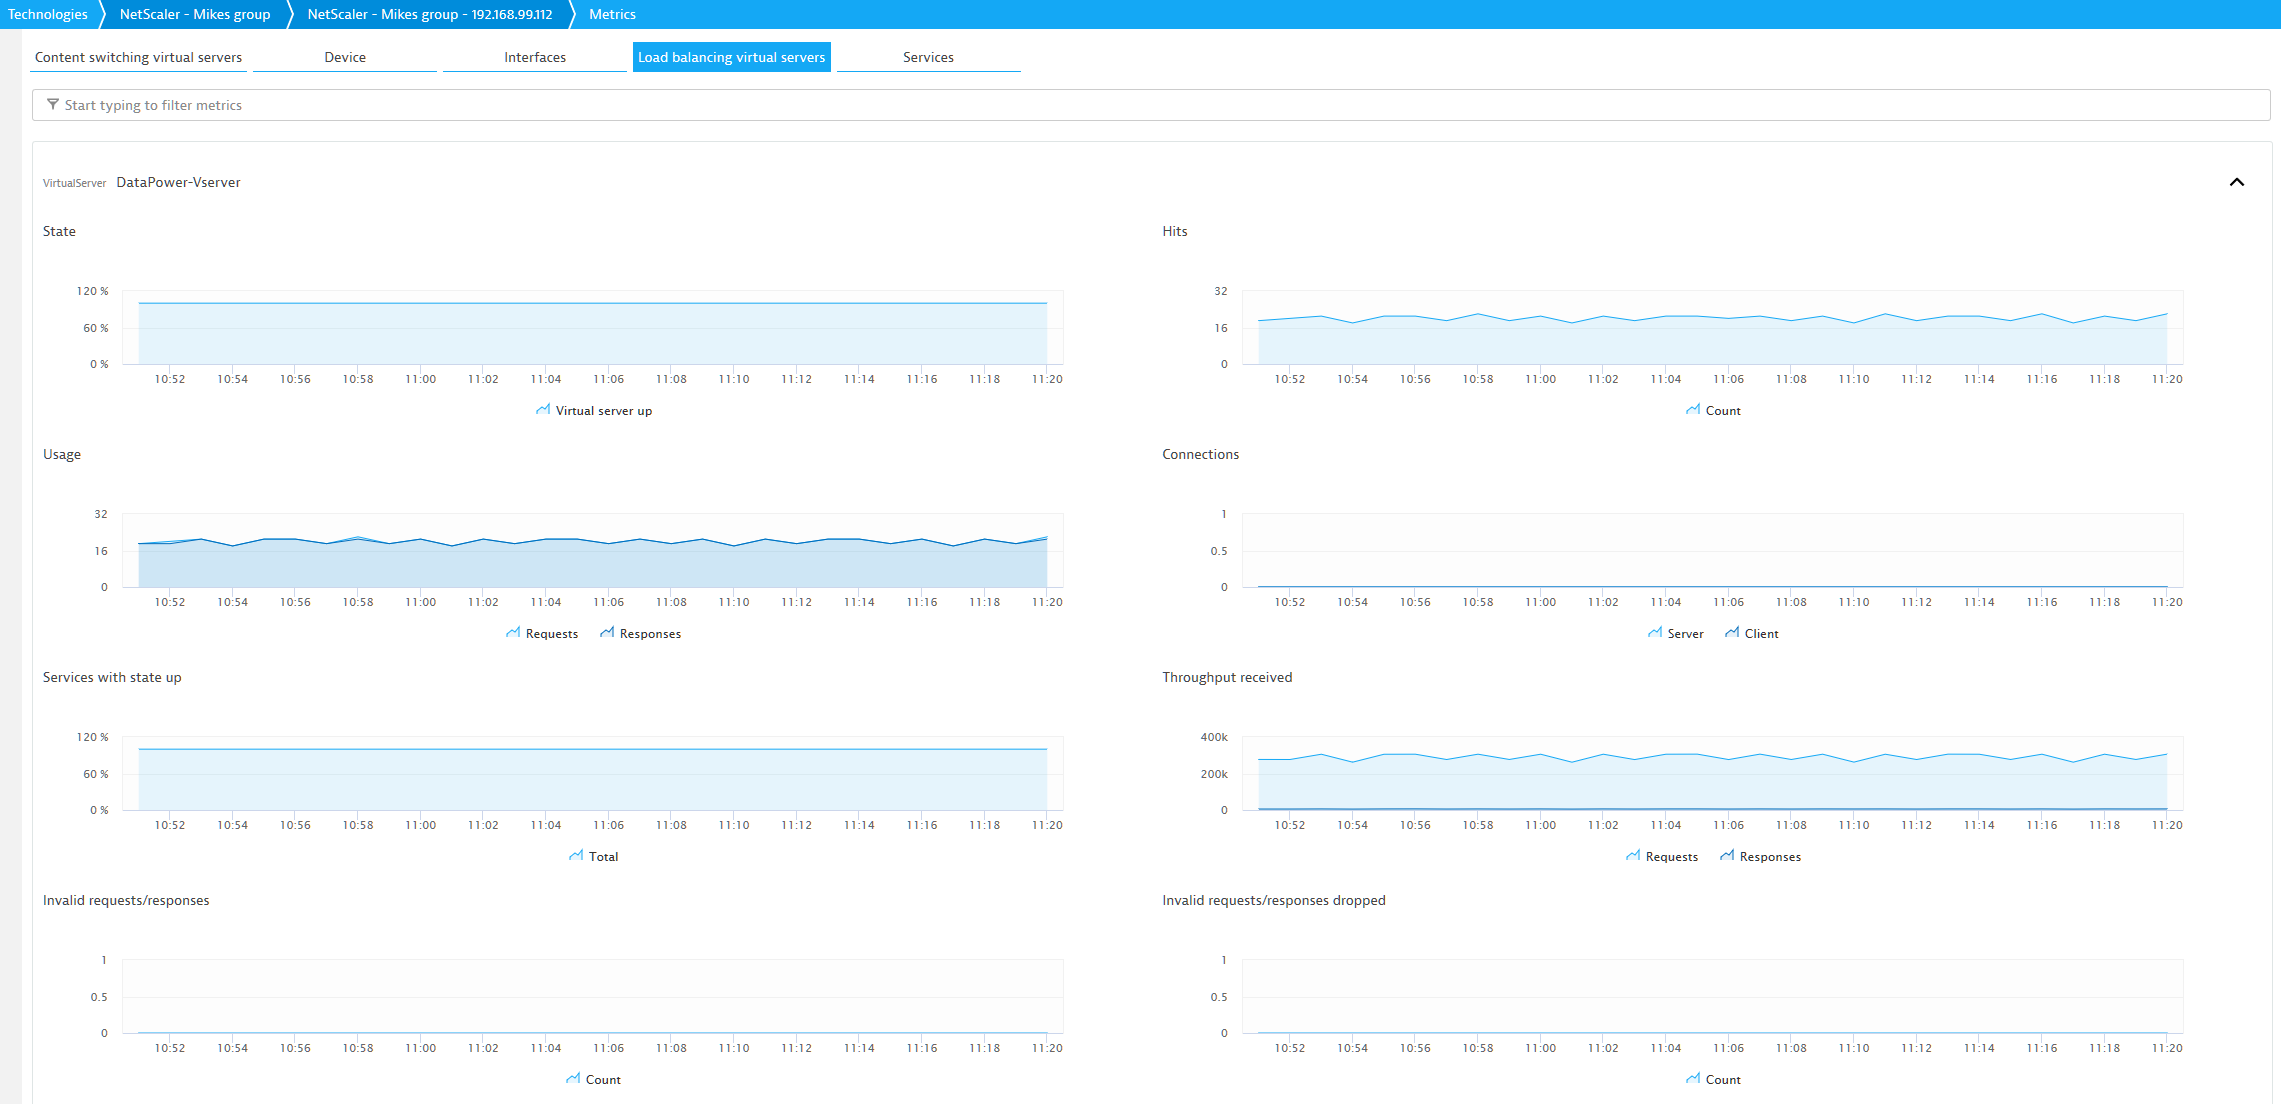 NetScaler device metrics